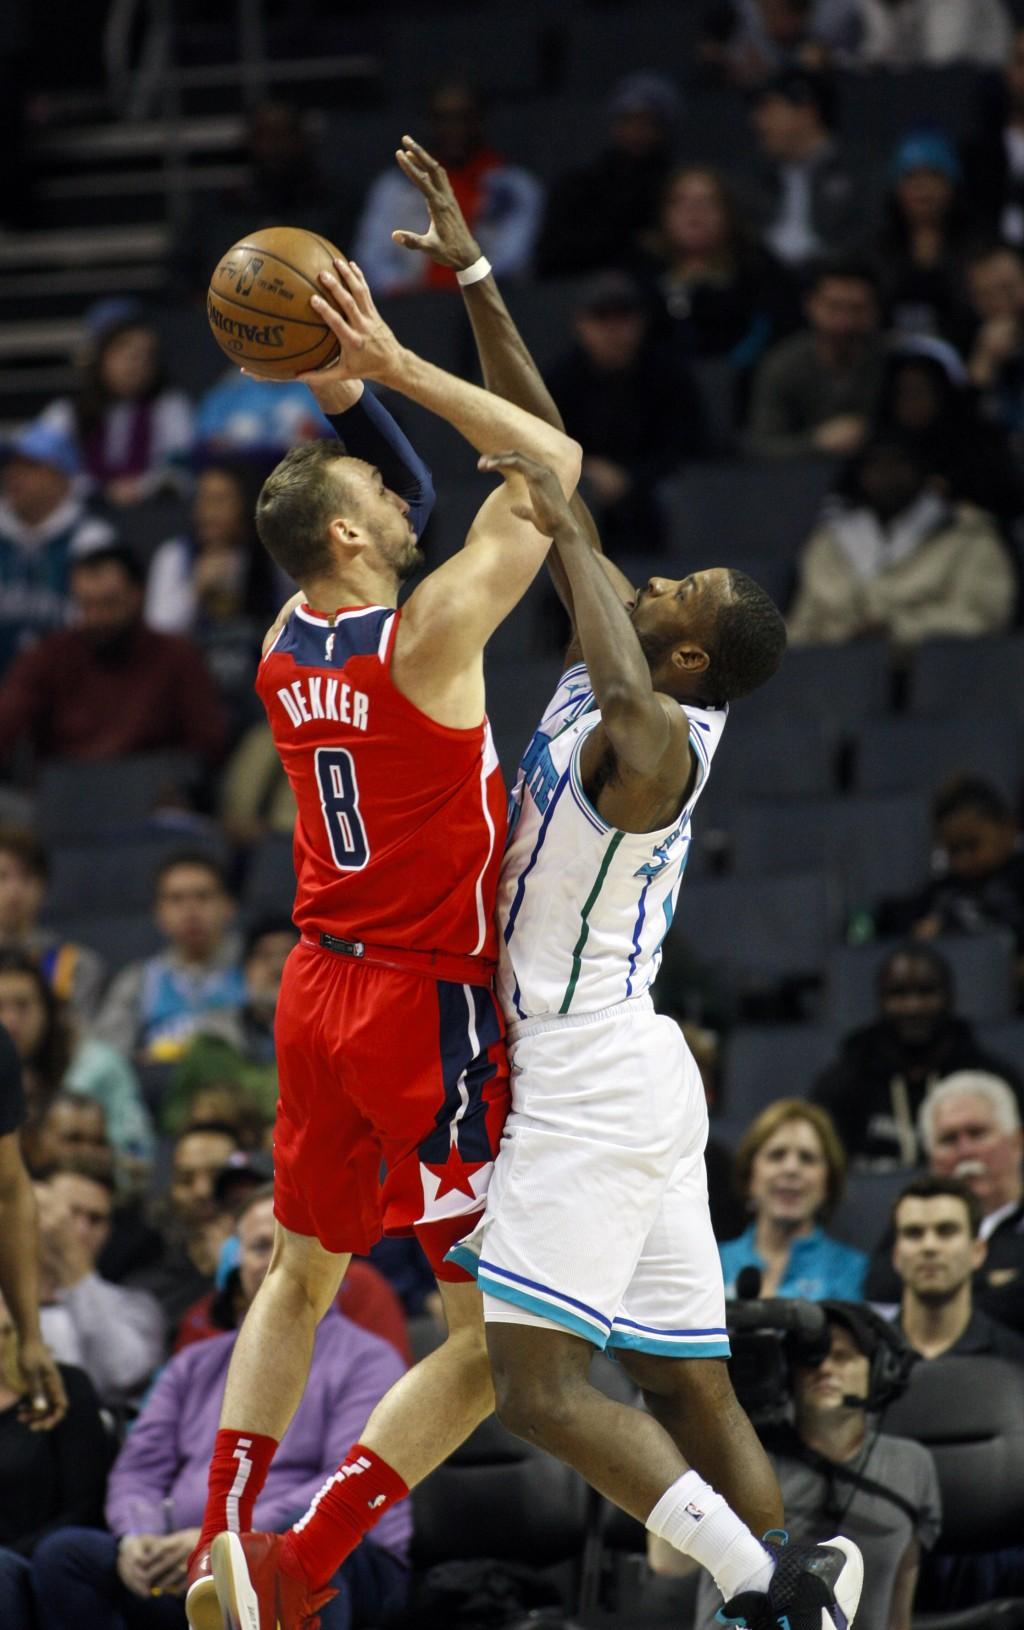 Washington Wizards forward Sam Dekker (8) shoots over Charlotte Hornets forward Michael Kidd-Gilchrist in the first half of an NBA basketball game in